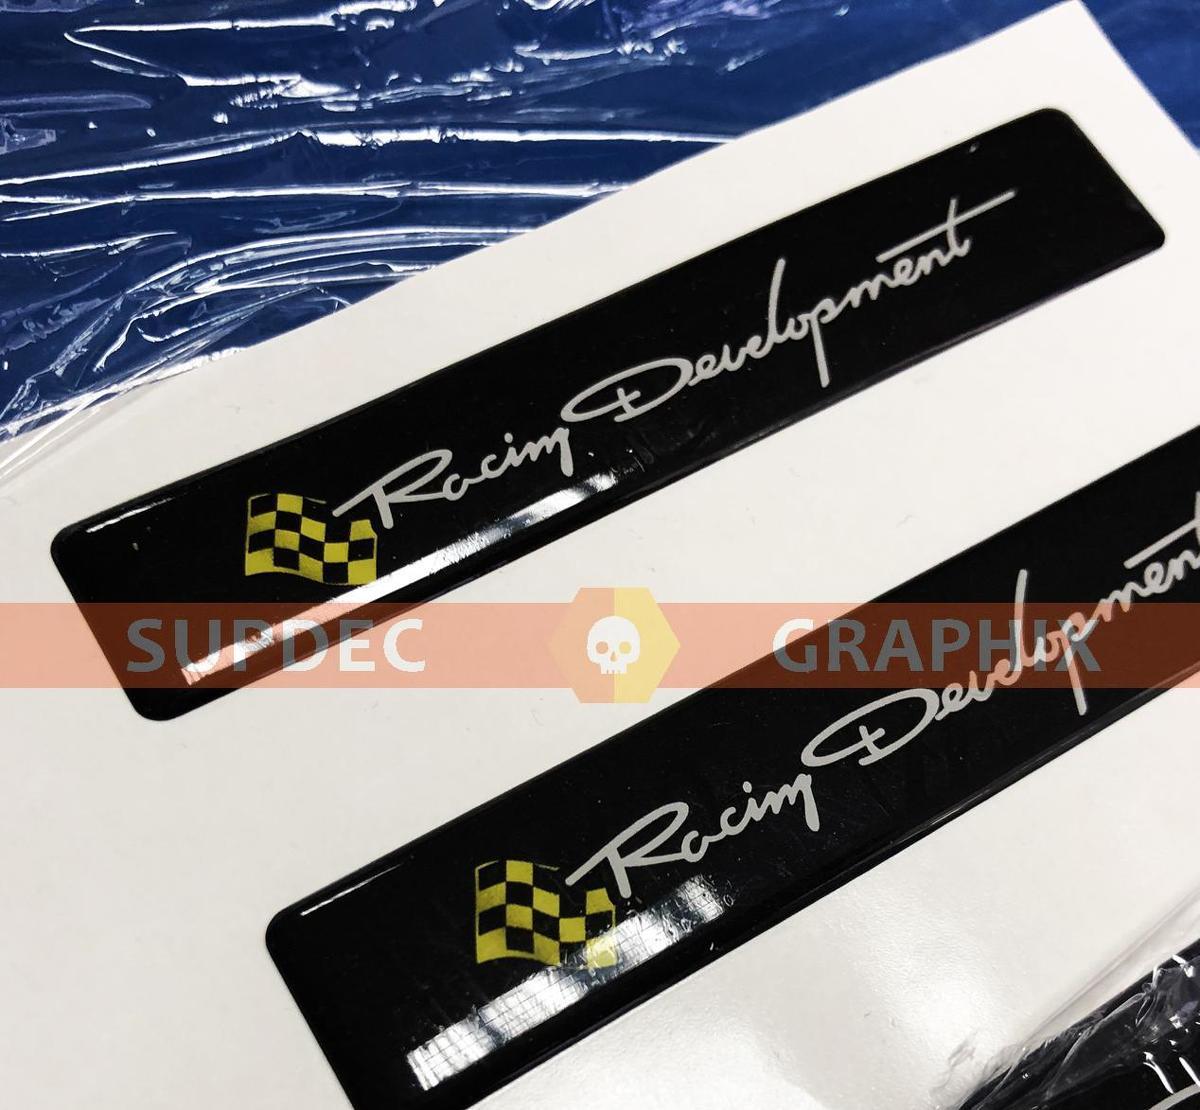 Kuppelaufkleber mit Racing Development-Emblem für Tacoma Tundra FJ Cruiser, passend für TRD